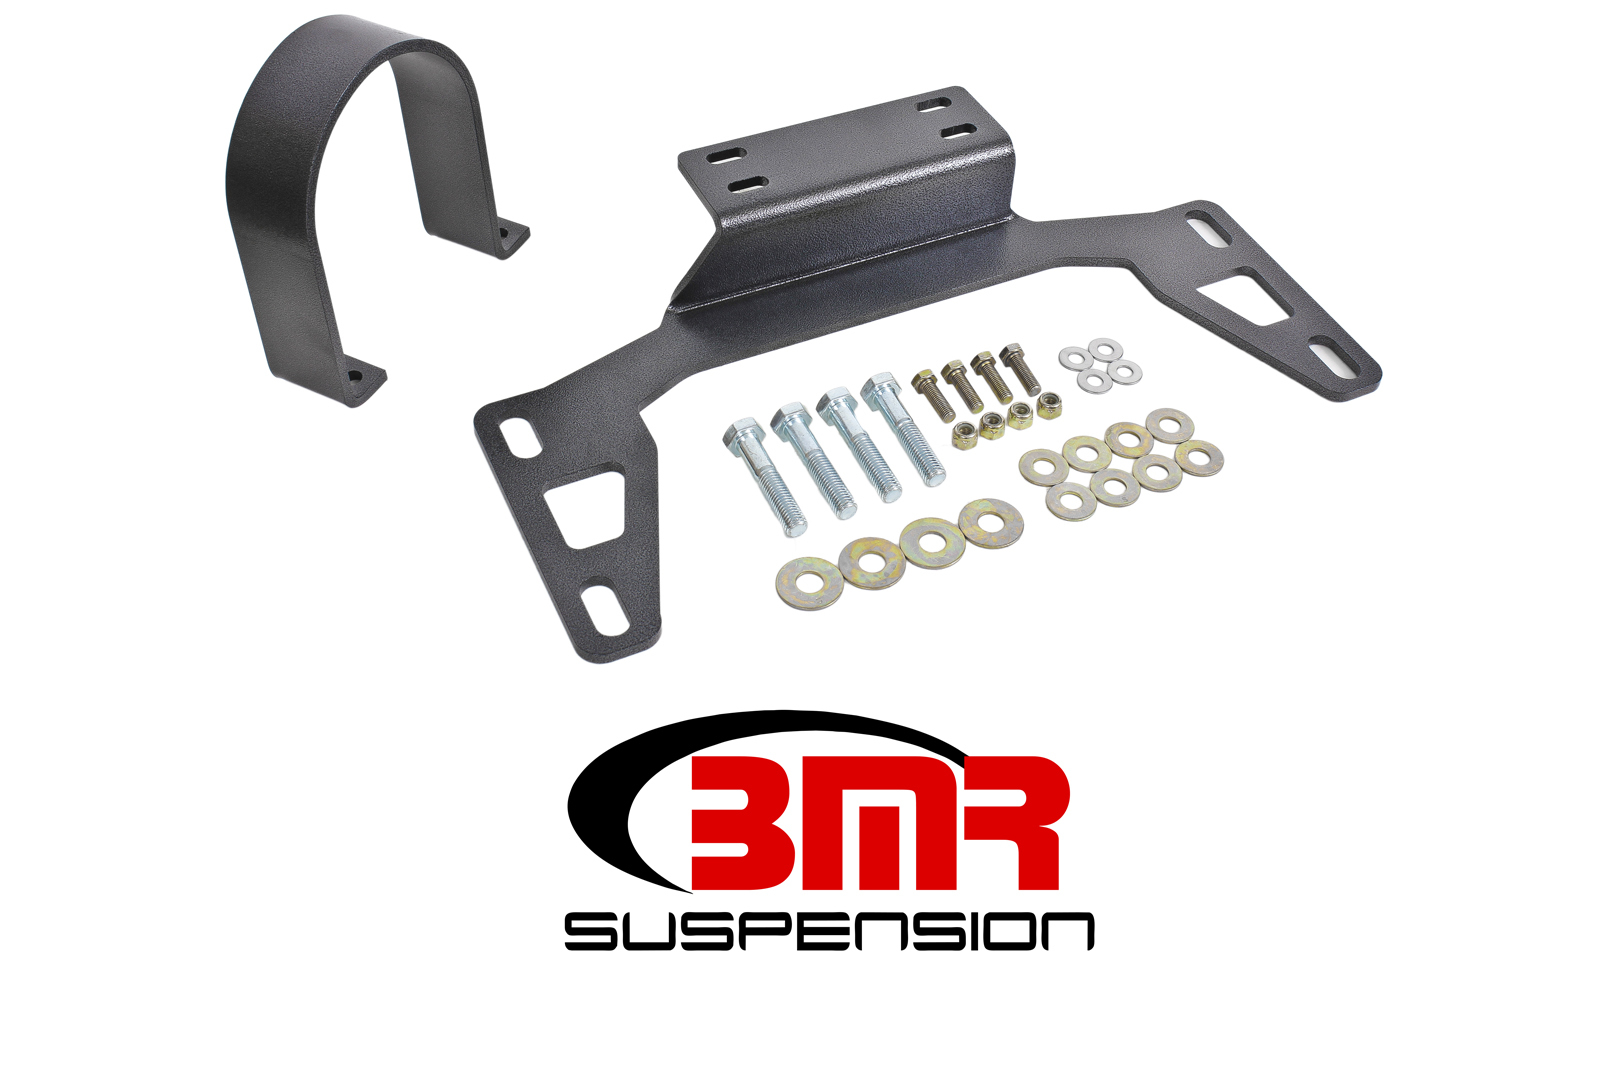 Bmr Suspension 11-20 Mustang Driveshaft Safety Loop Front